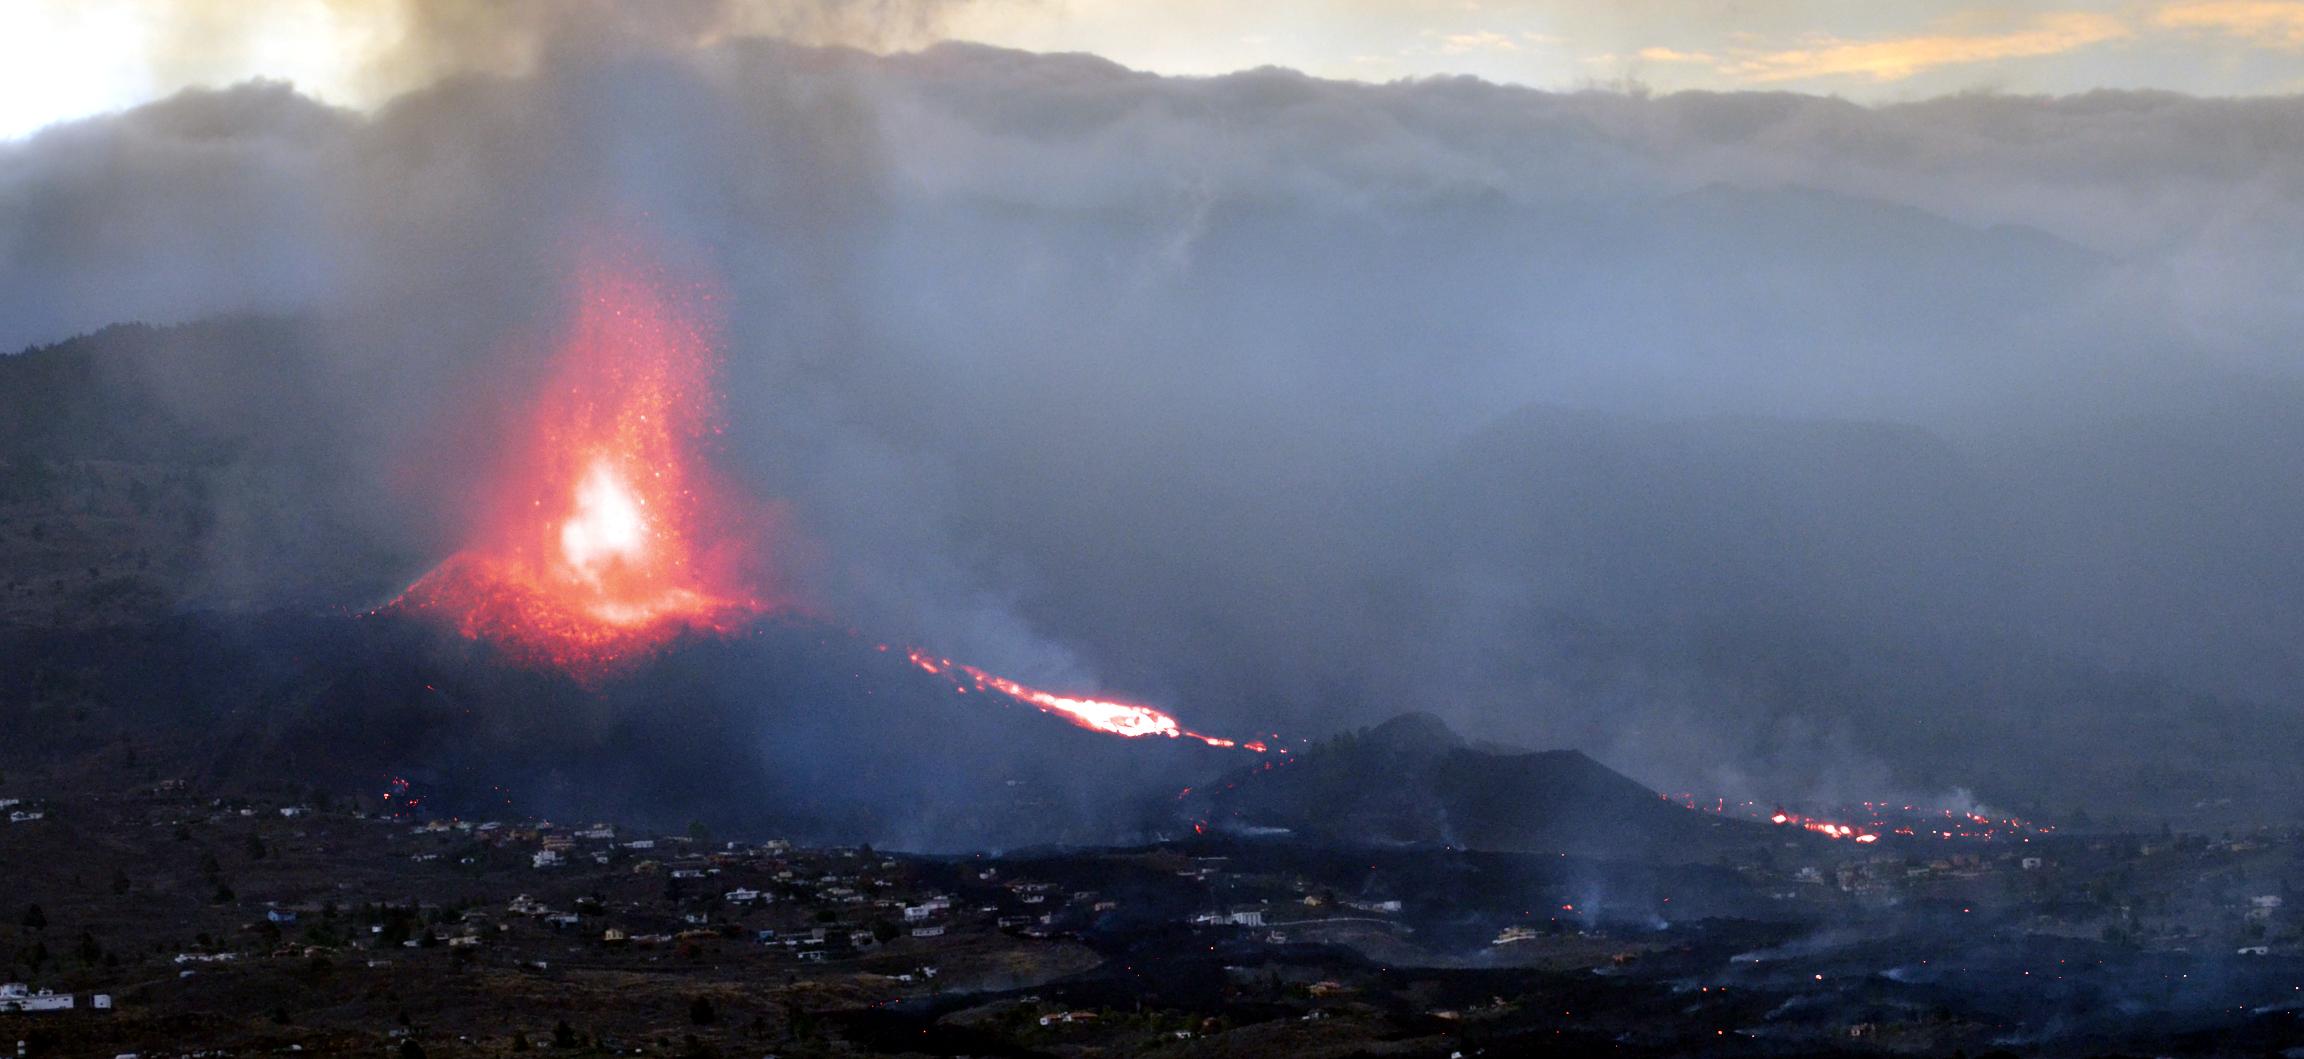 Imagen visible + swir DRAGO volcán La Palma